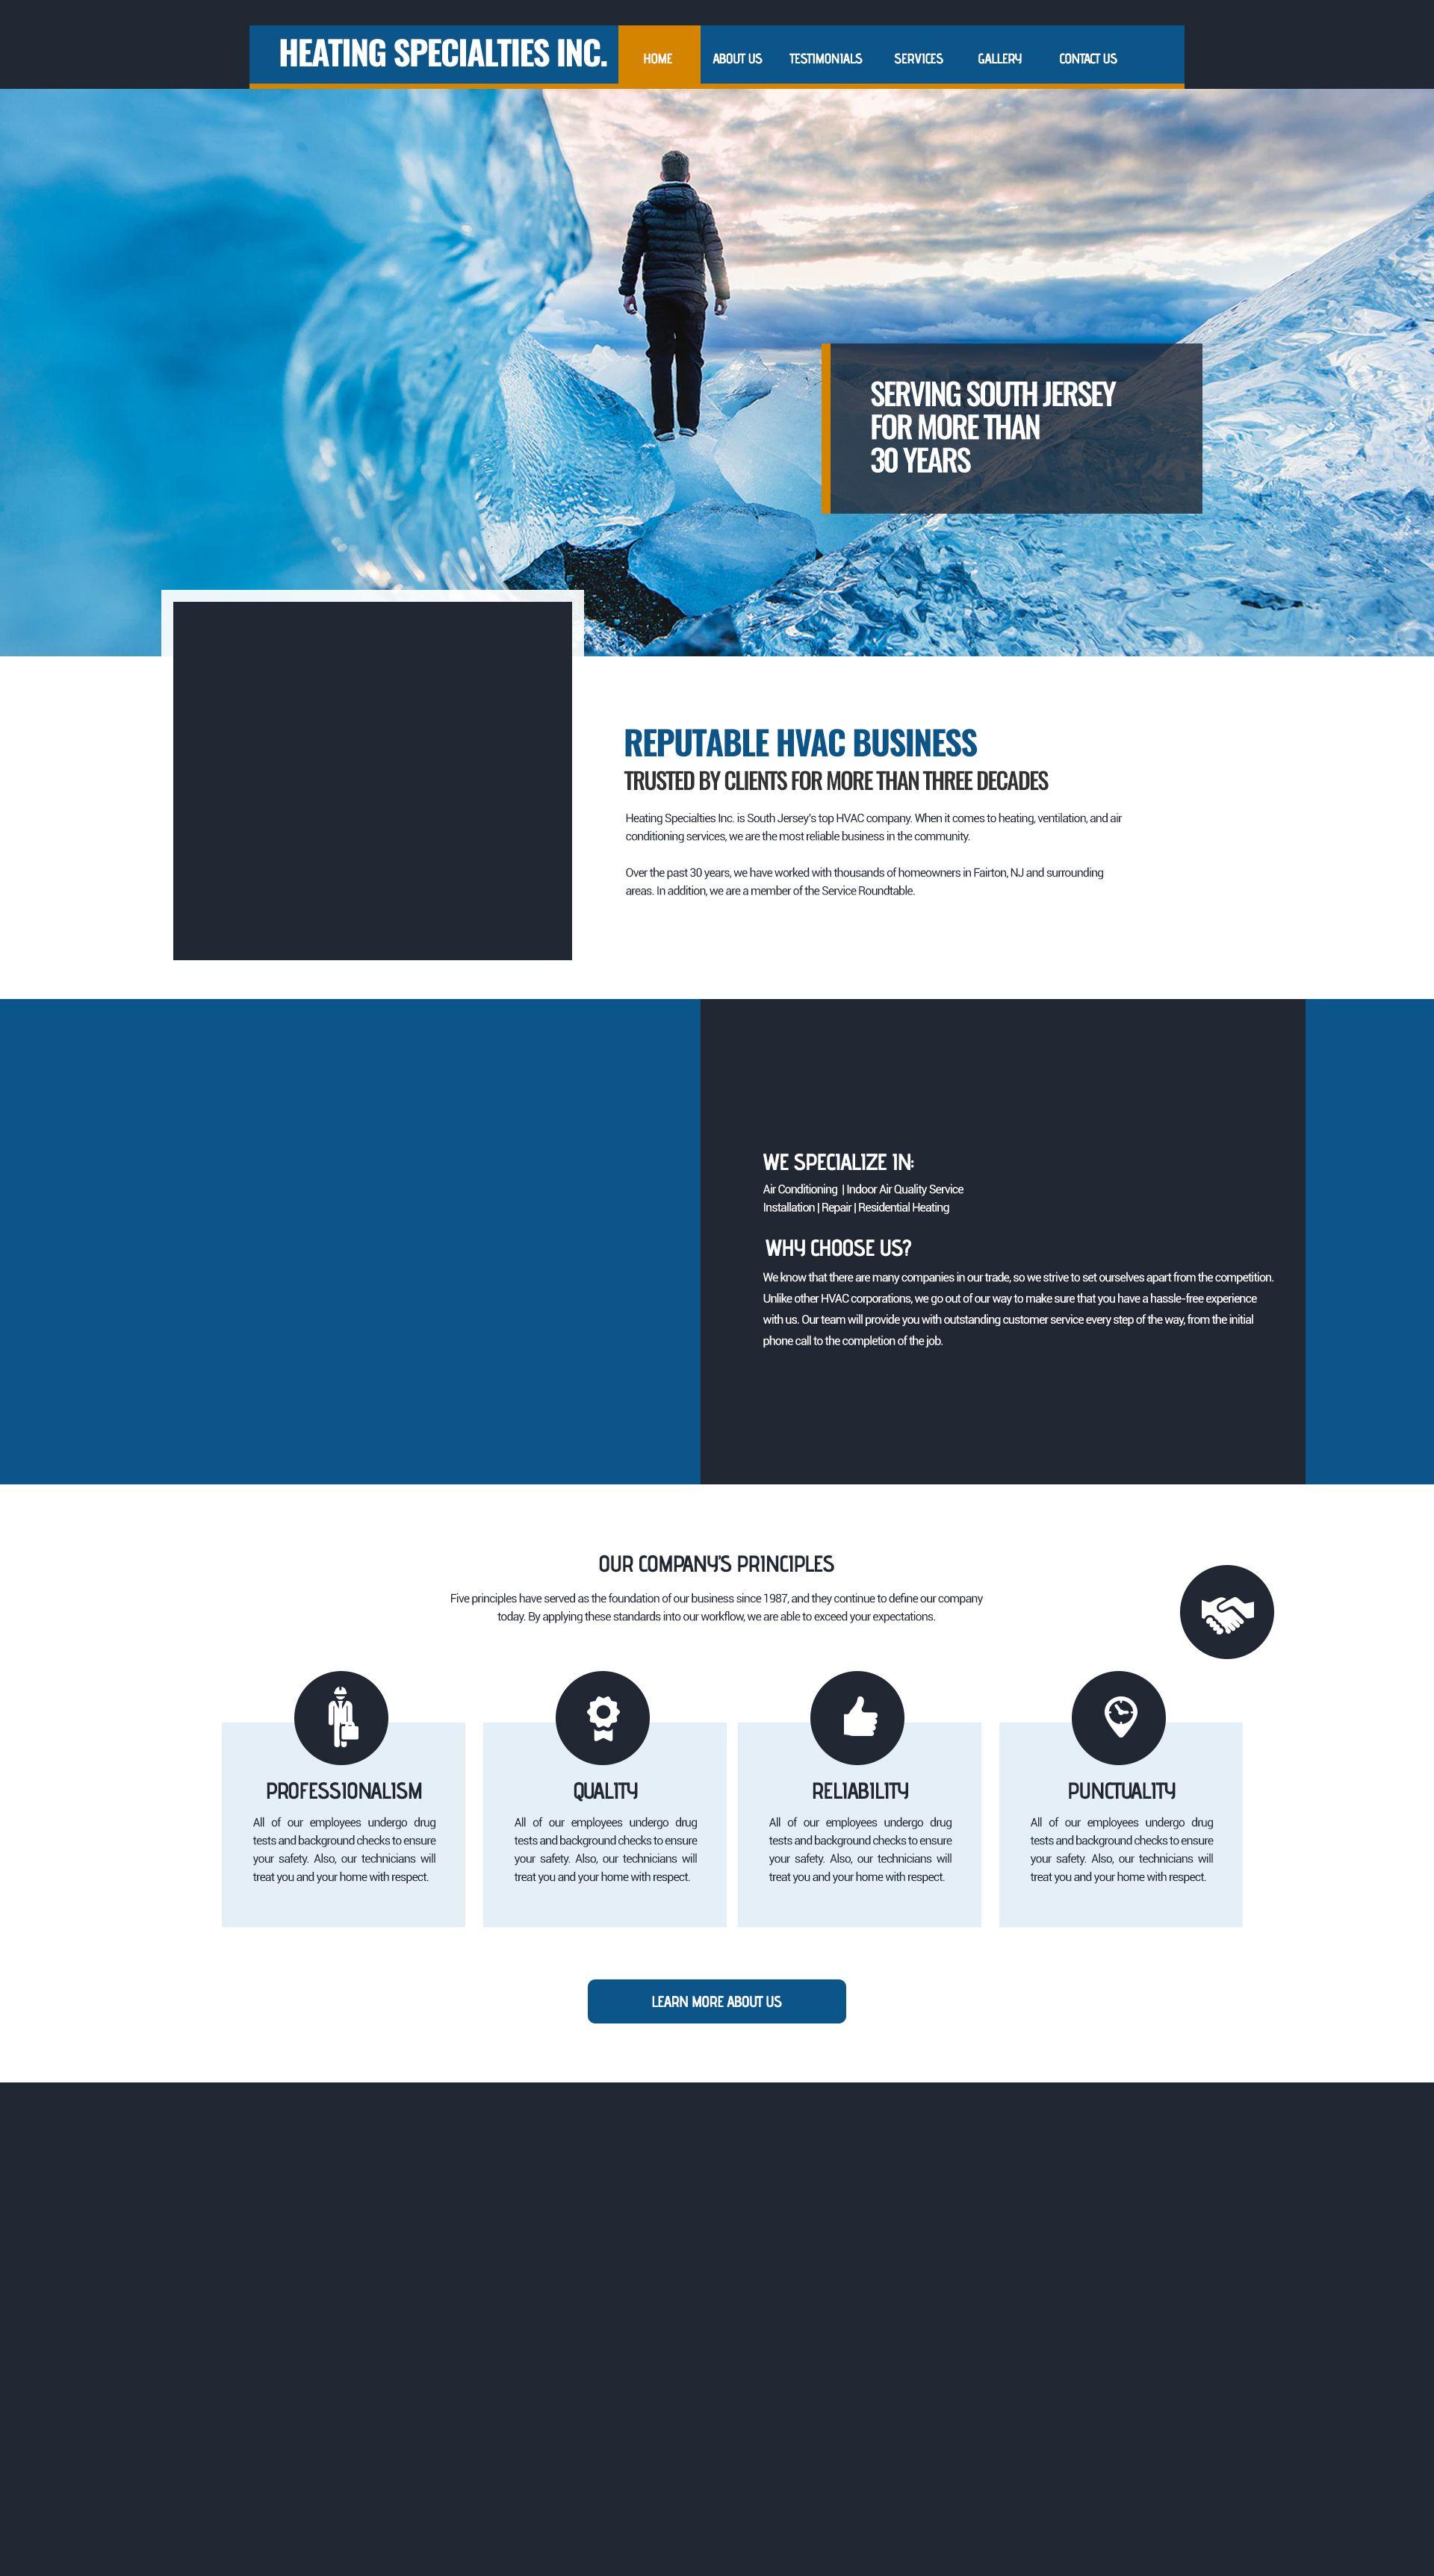 Air Condition Web Design Hvac Business Web Design Template Design